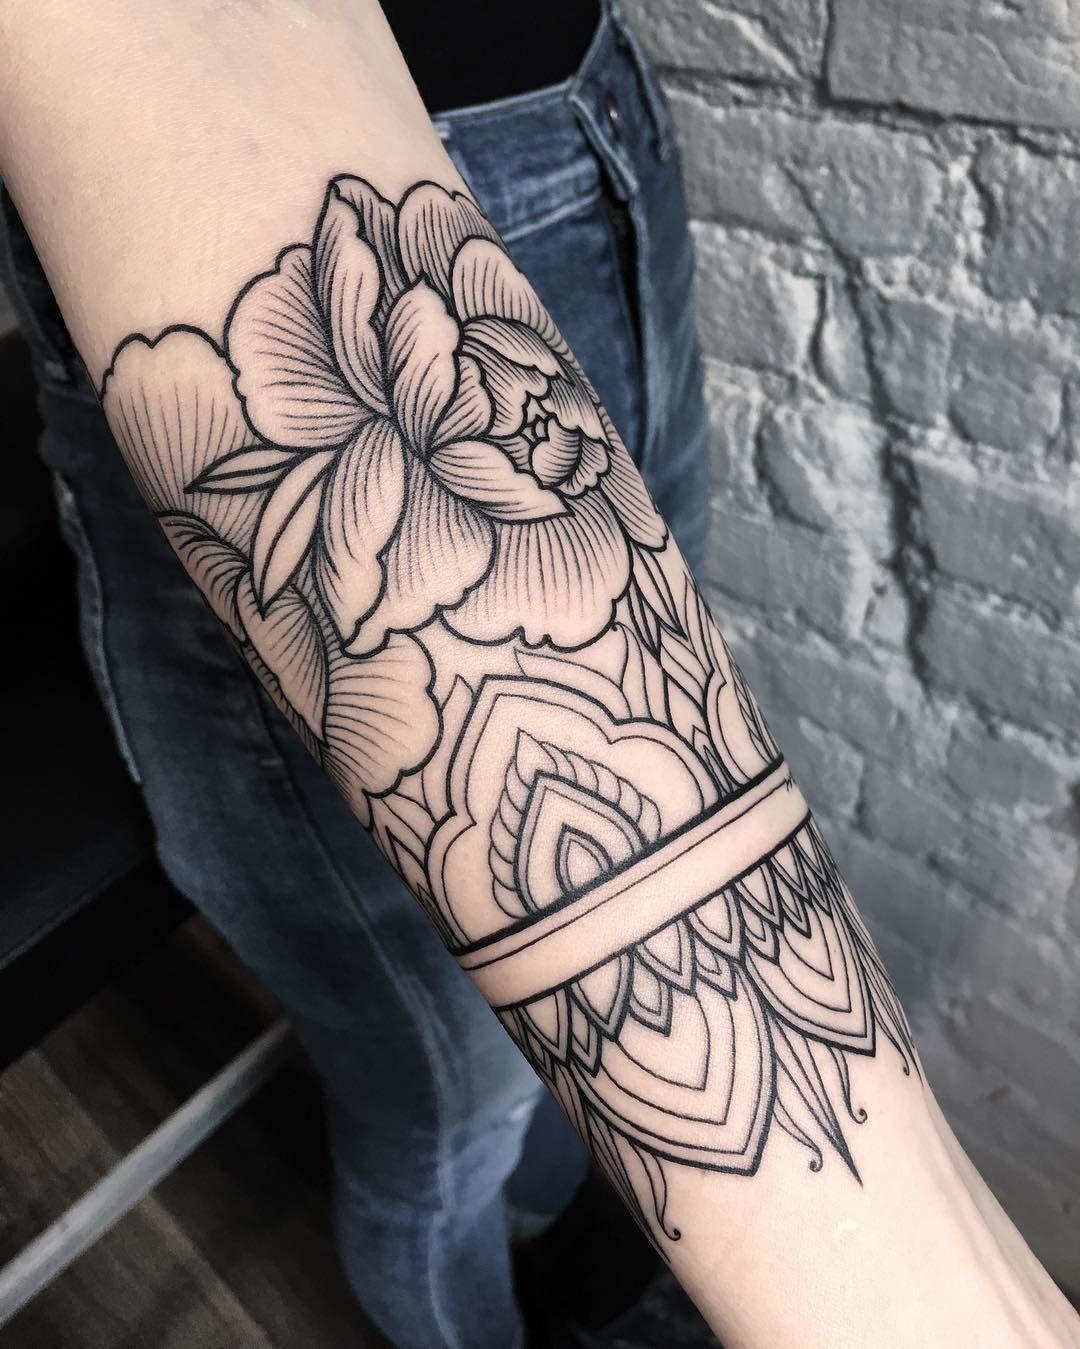 27 Inspiring Rose Tattoos Designs Kropka Kreska Tatuaż